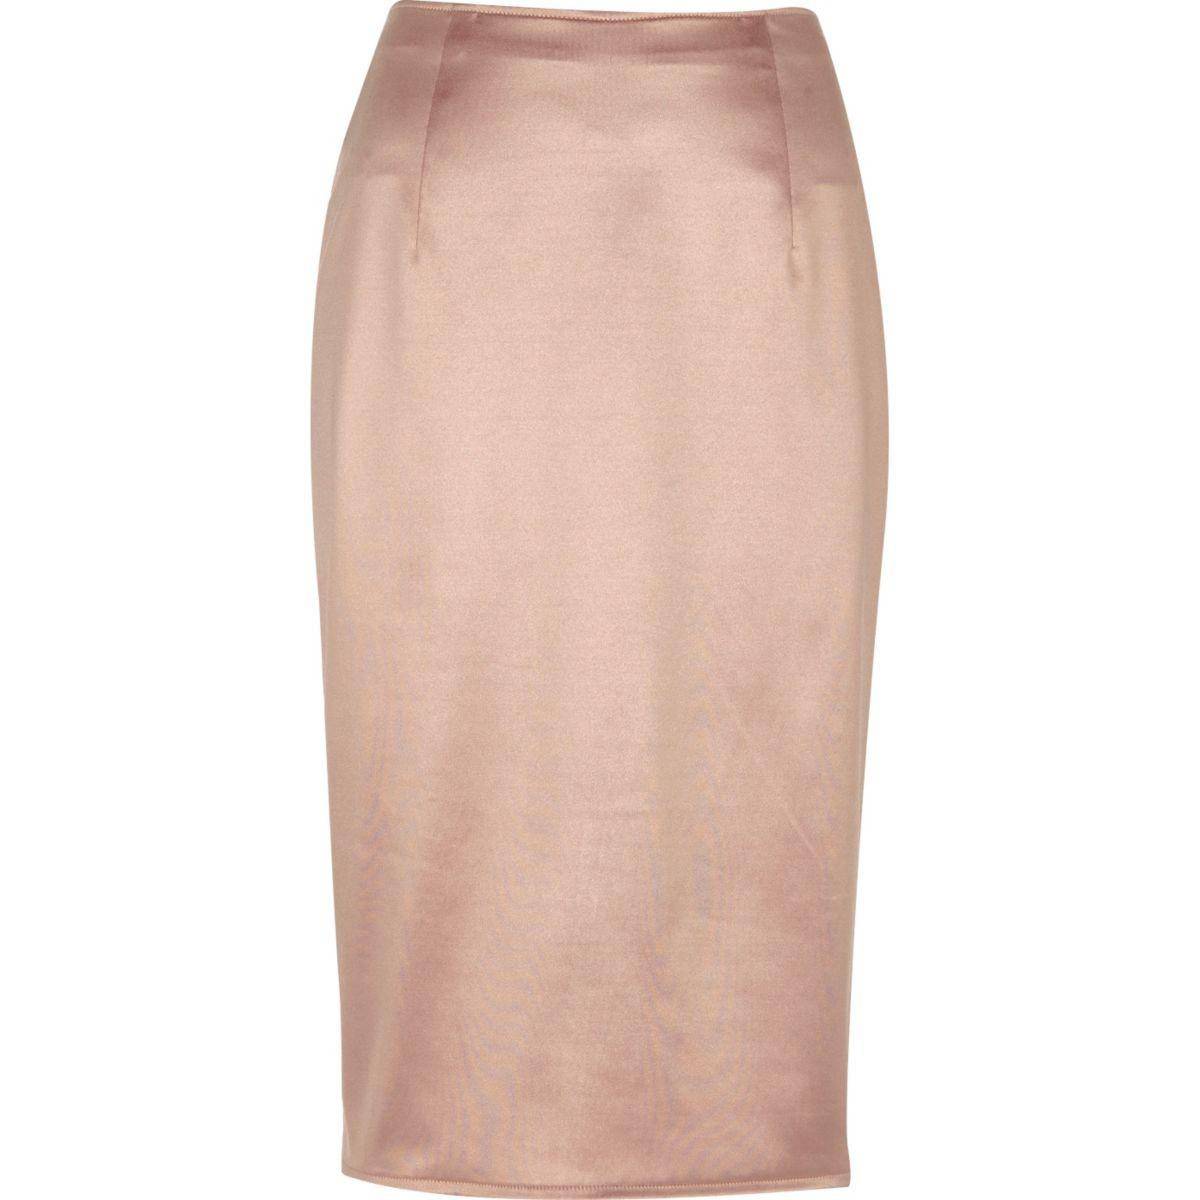 Blush pink soft pencil skirt